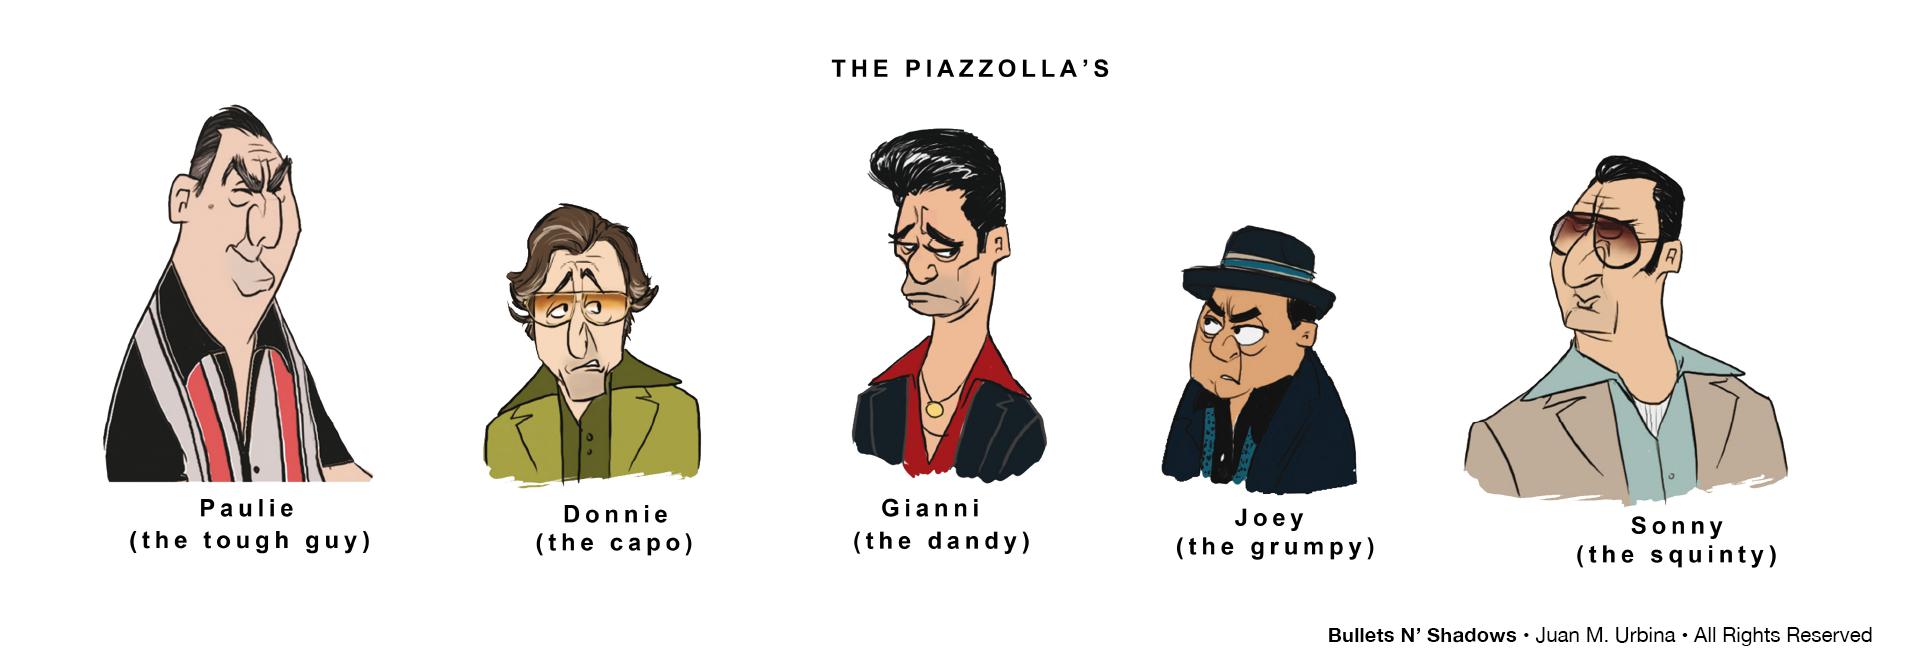 piazzollas.png